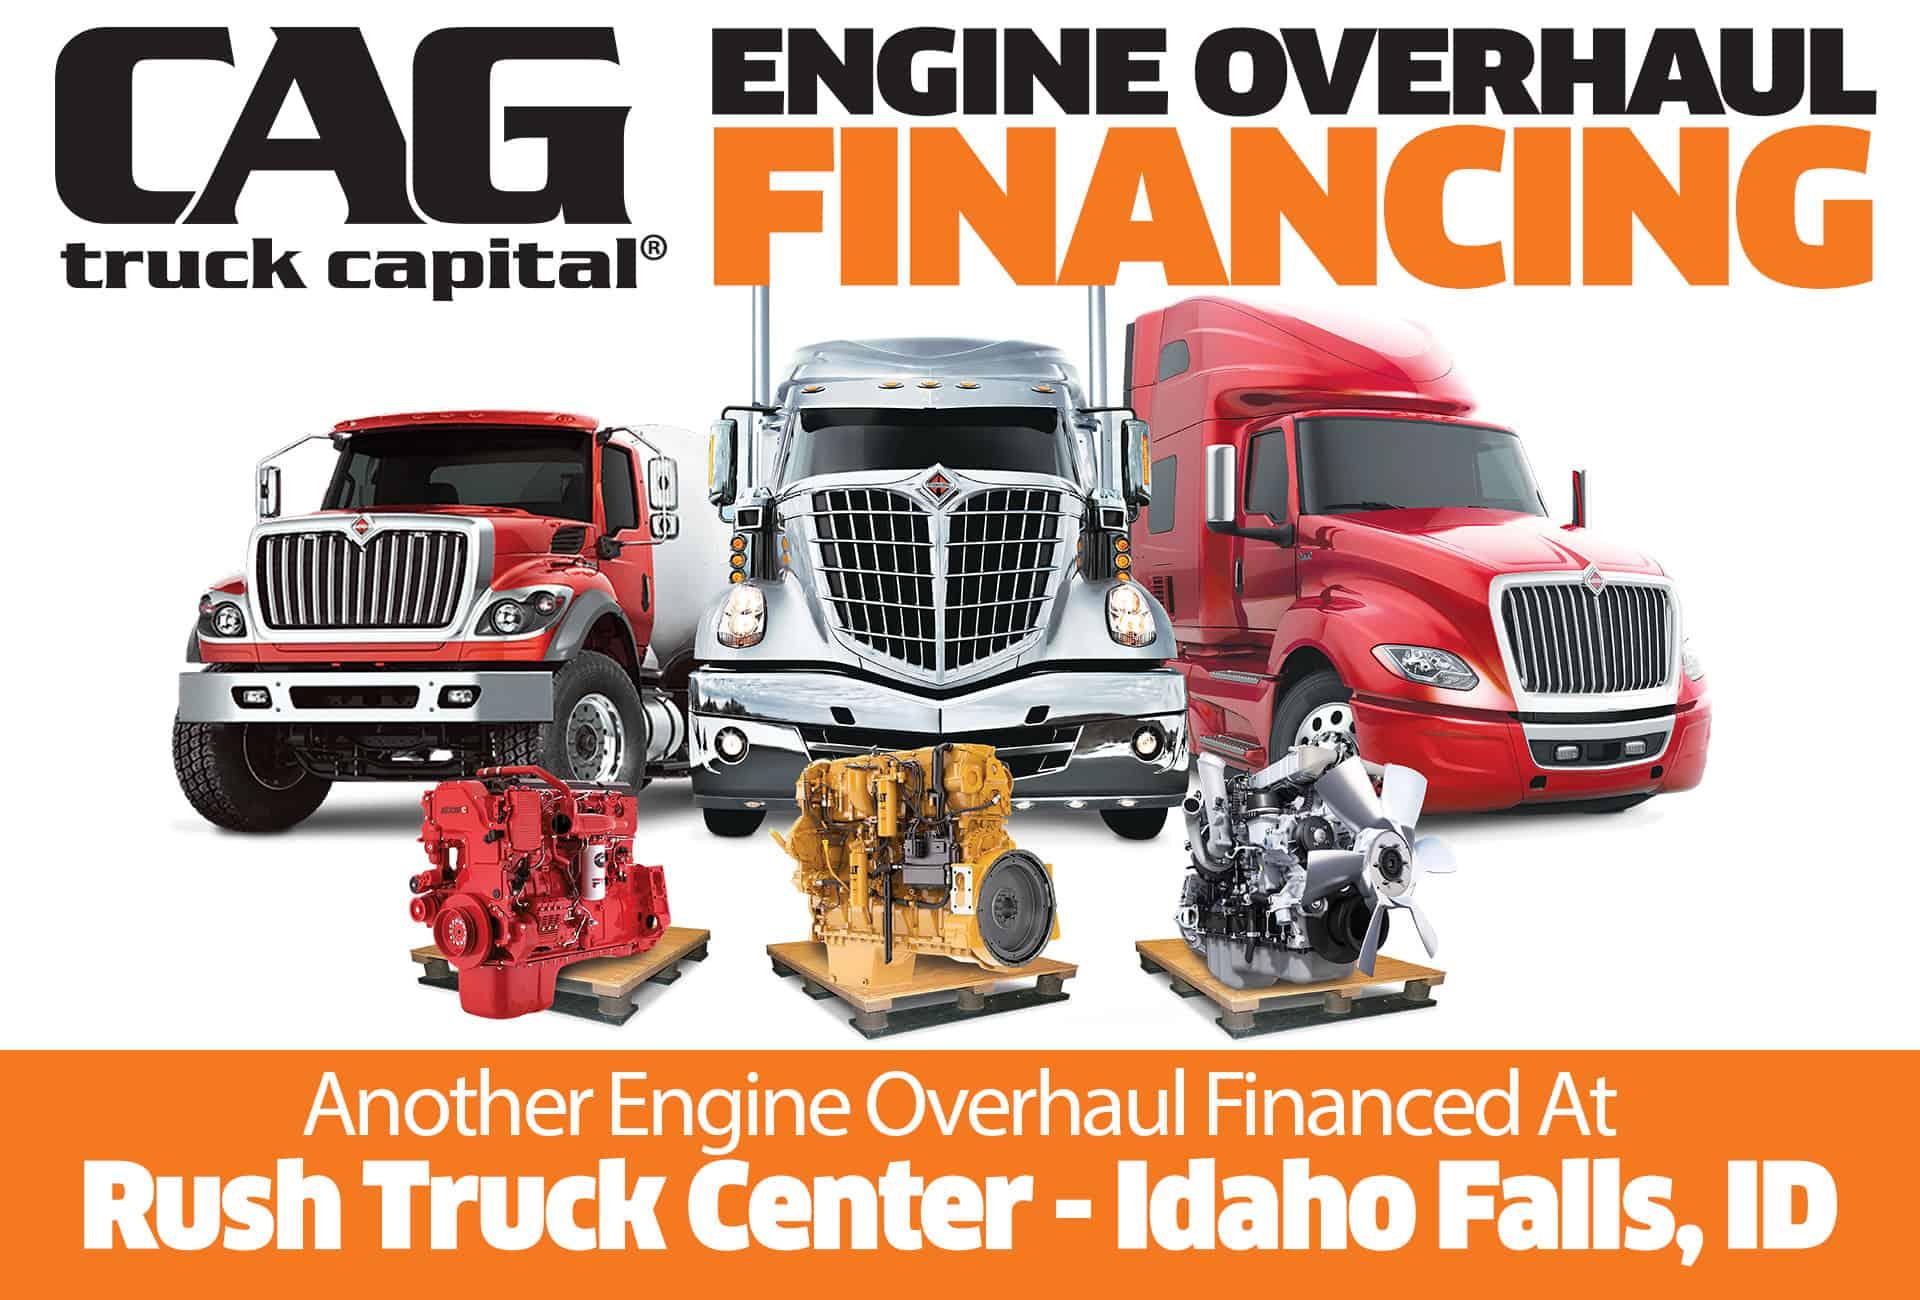 Rush Truck Center Idaho Falls ID